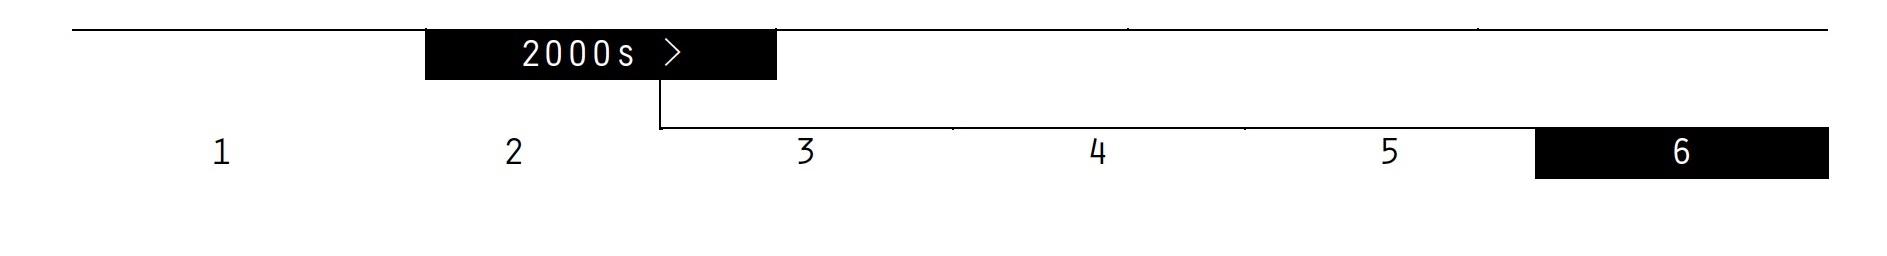 TABLE HEADERS WORDPRESS bw 2000-5 copy